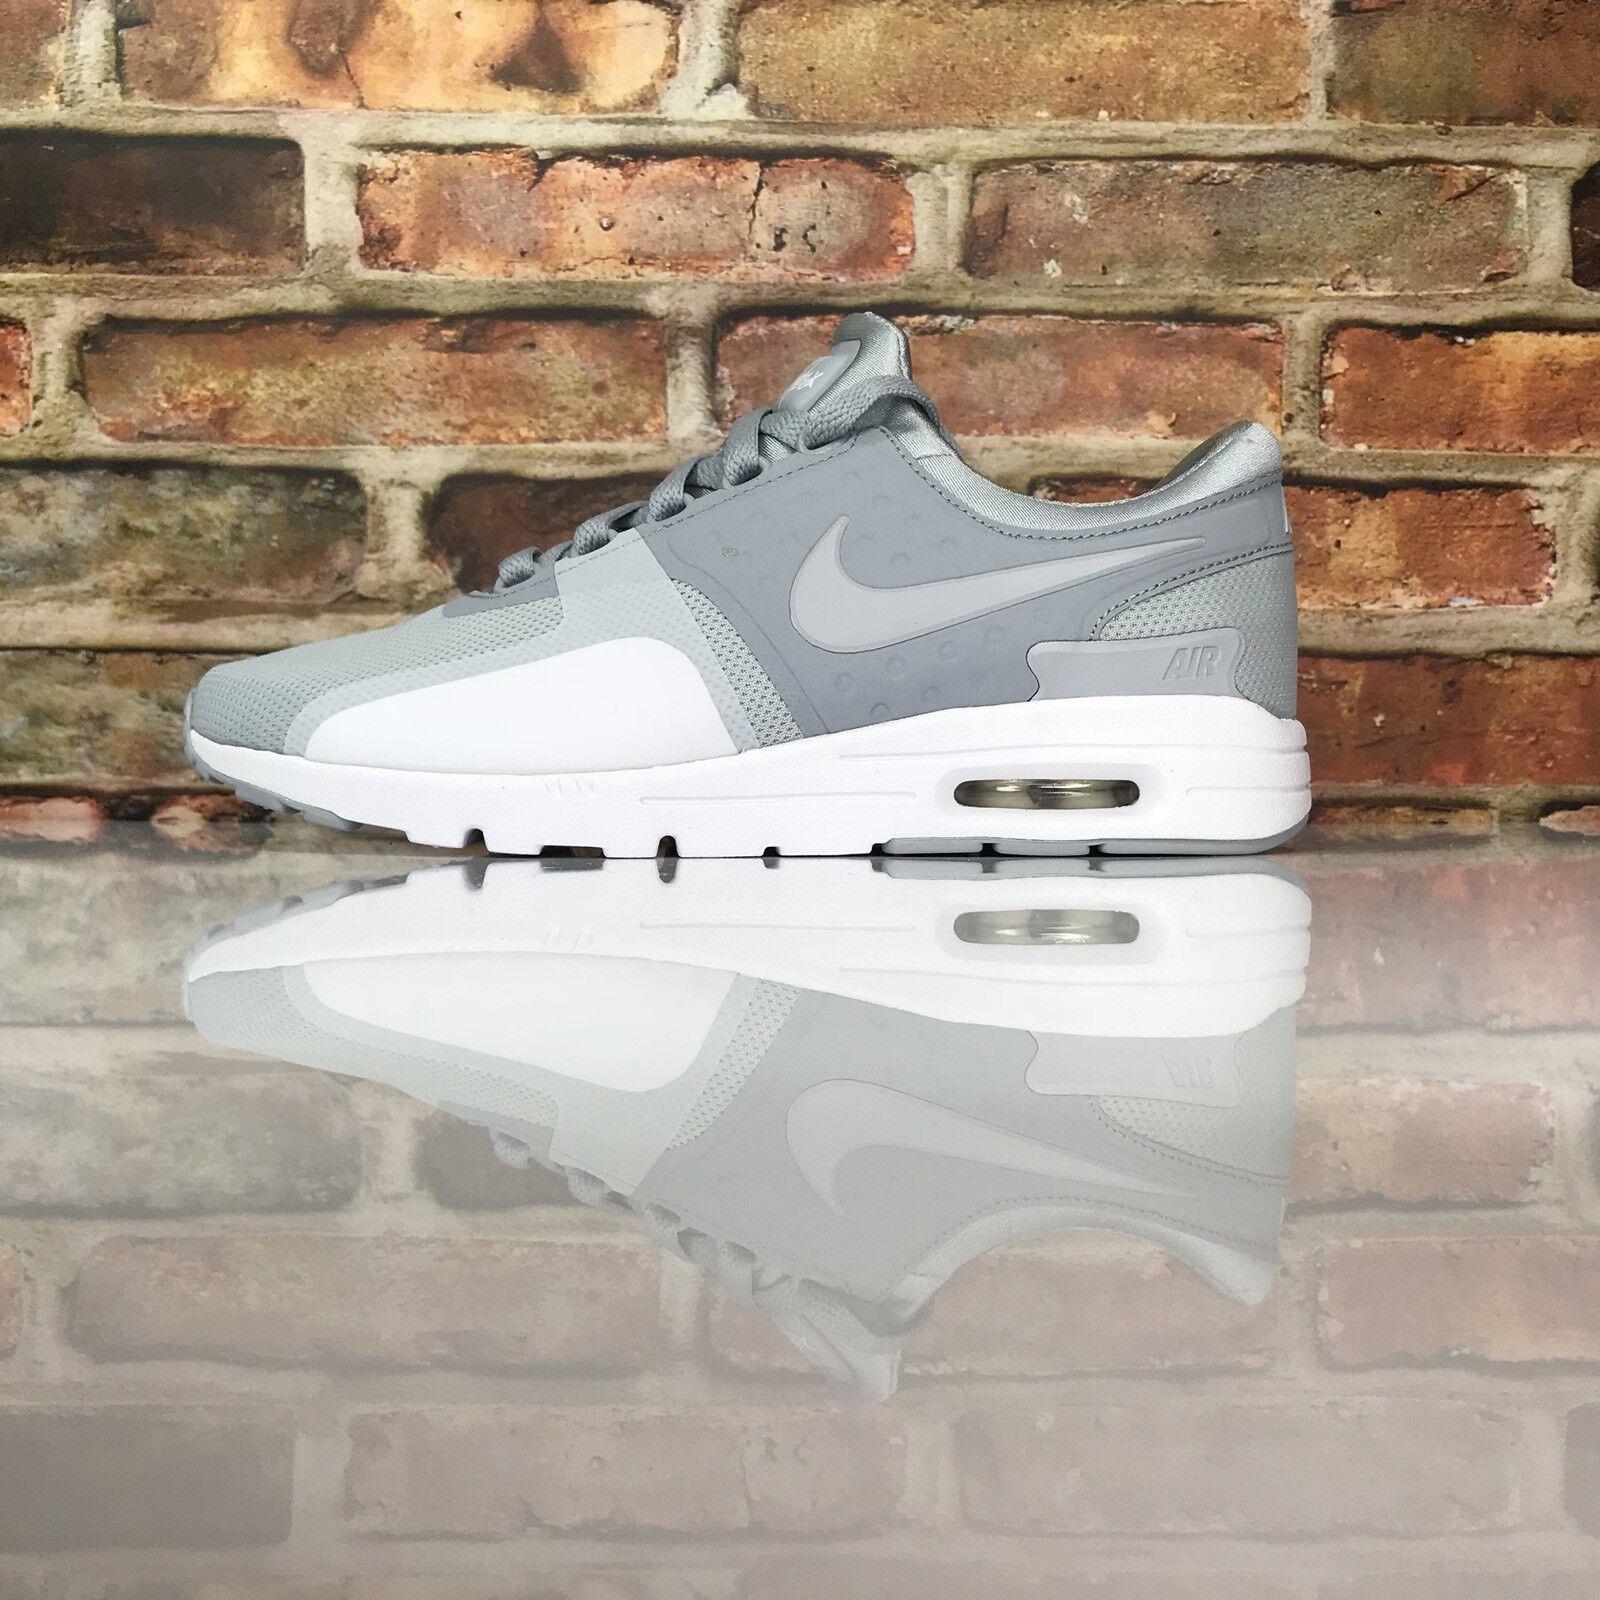 Nike Women Air Max Zero Size 10 Running Athletic Fashion Sneaker Shoe wolf grey